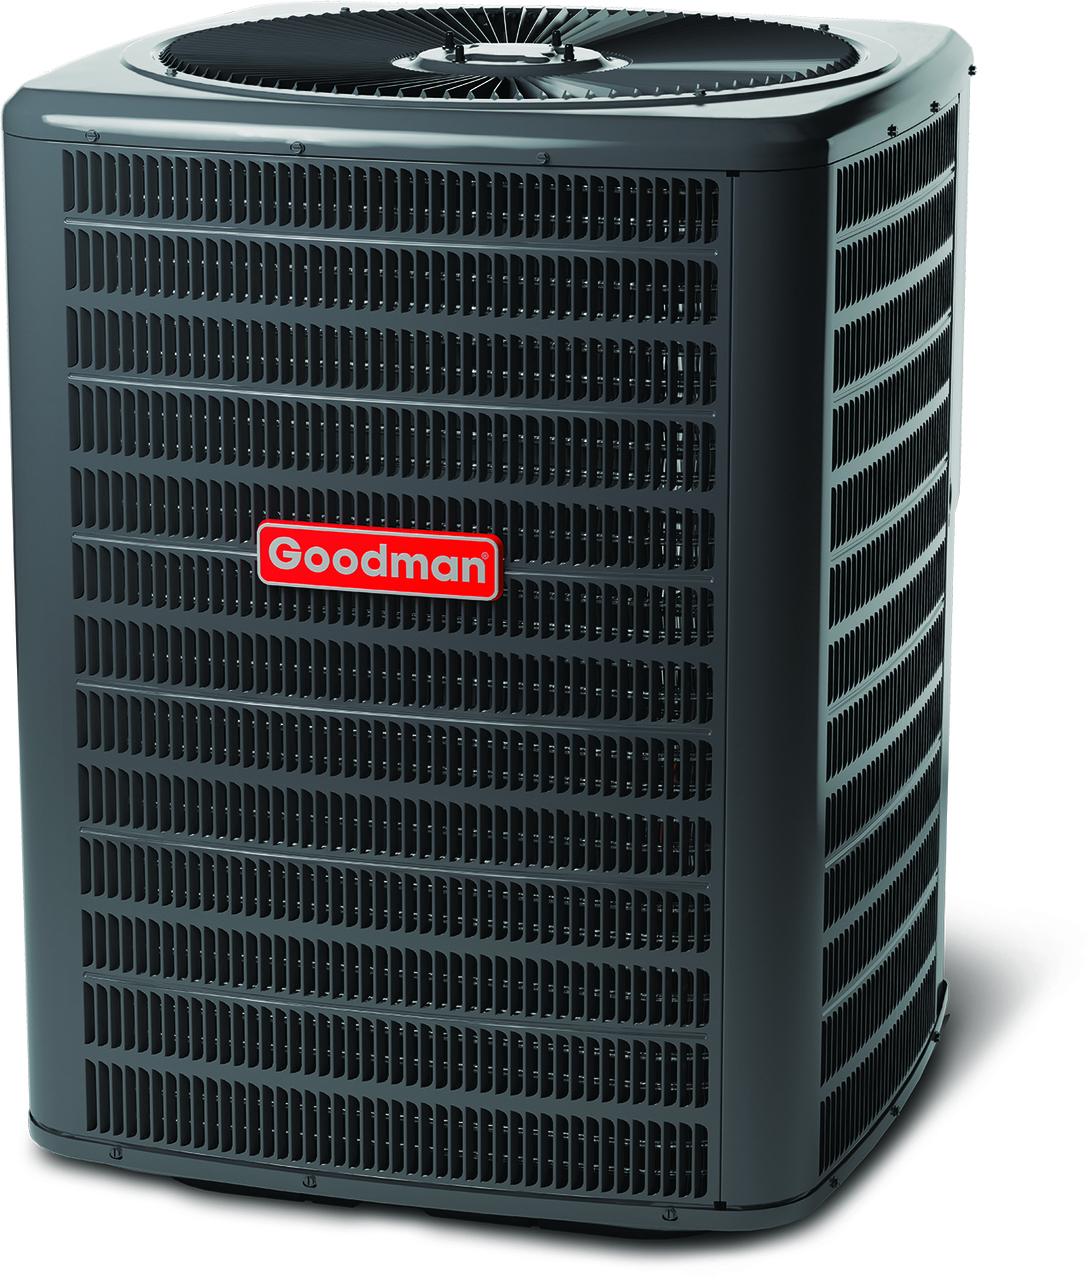 Goodman Gsx130601 5 Ton Split System Air Conditioner